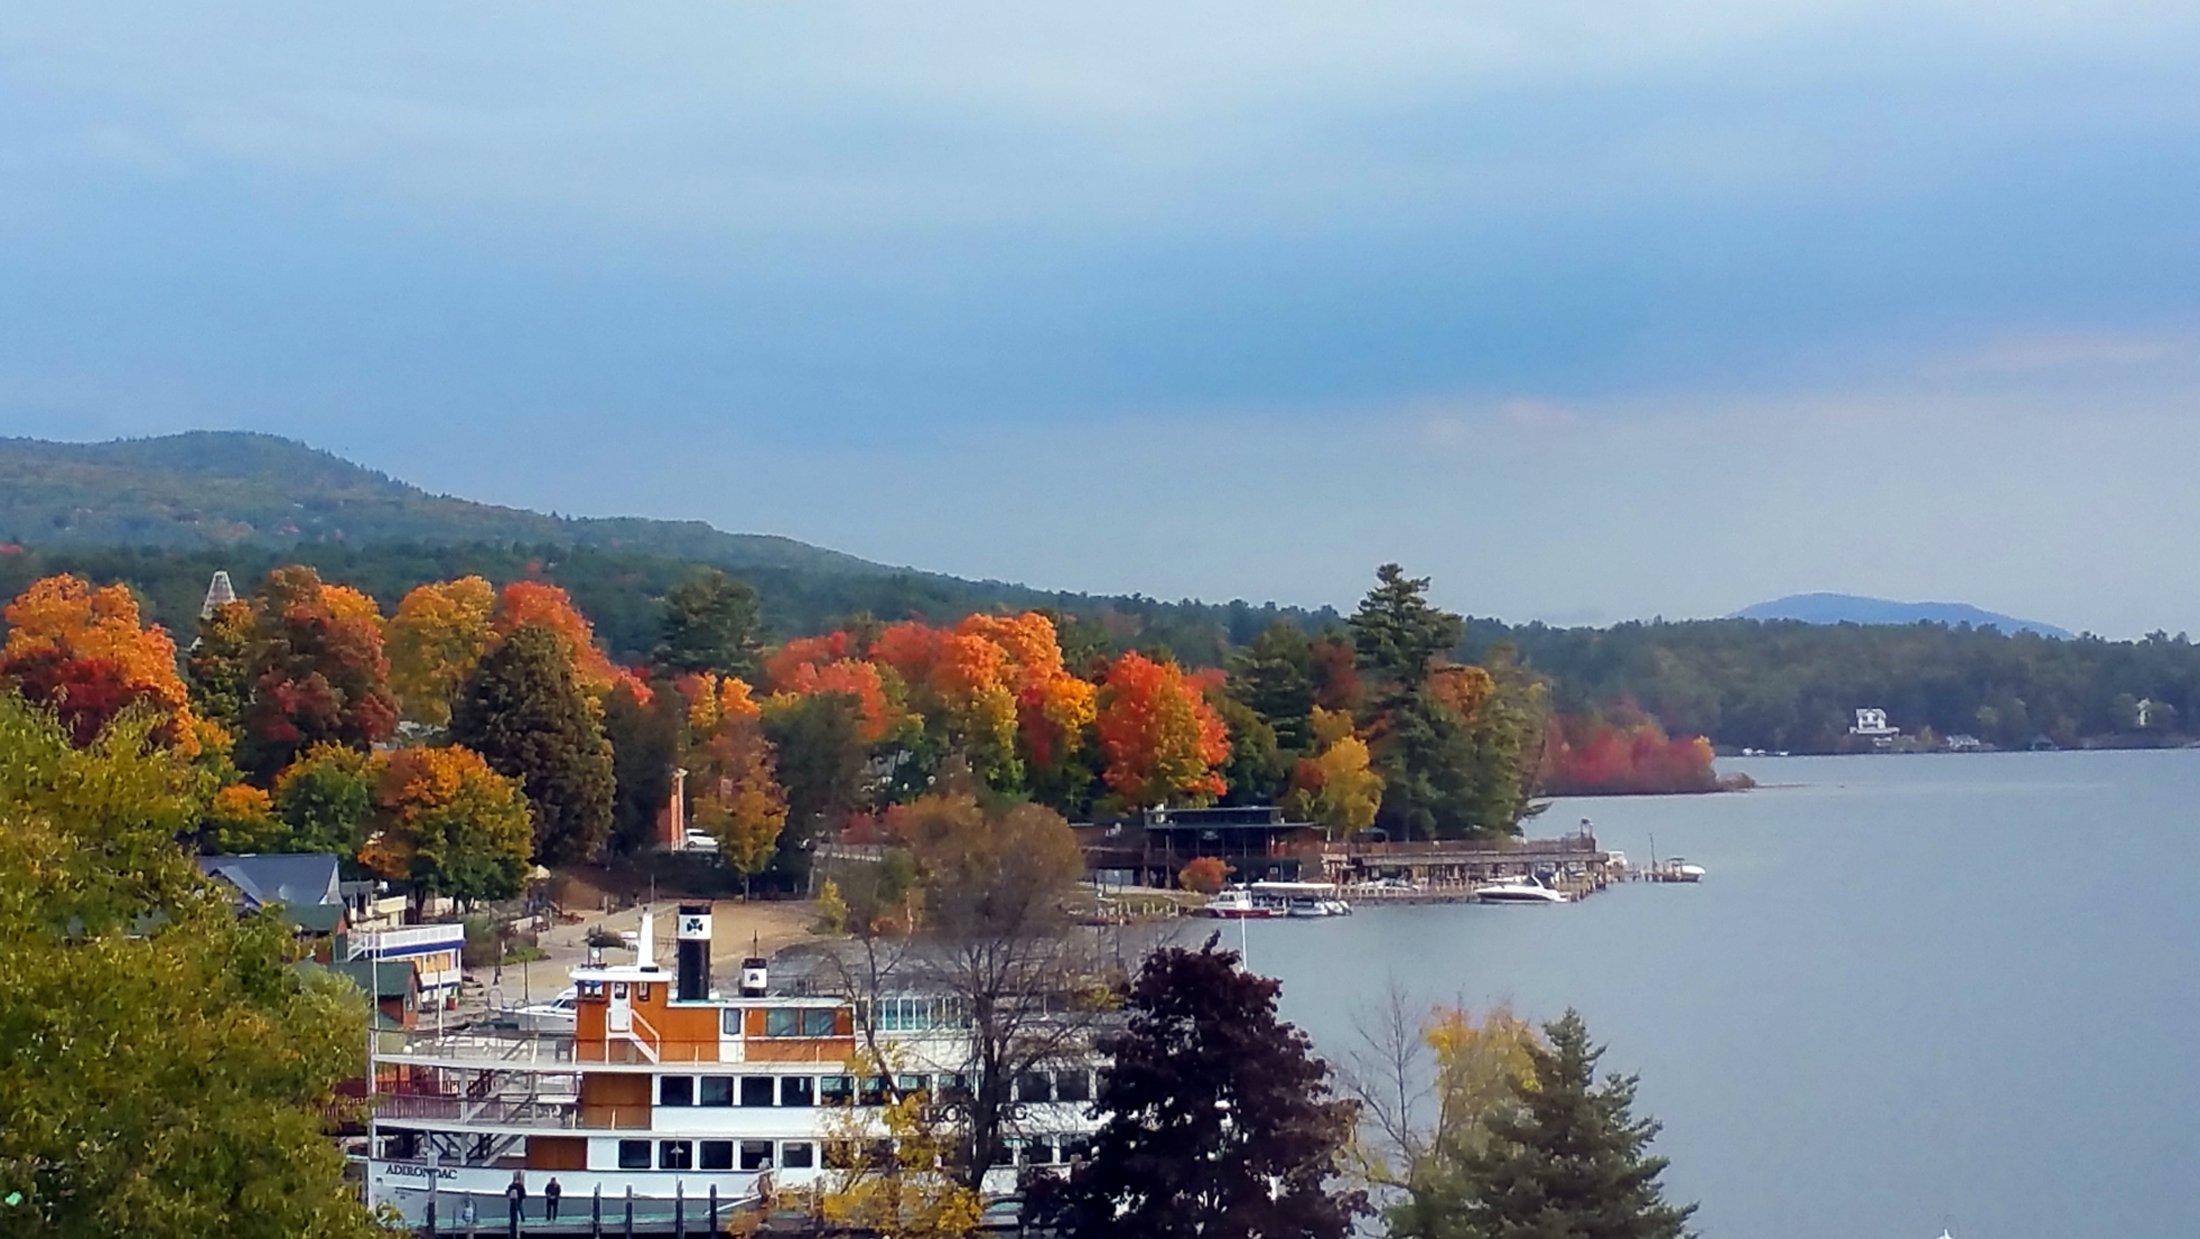 lake-george-shore-autum-colors